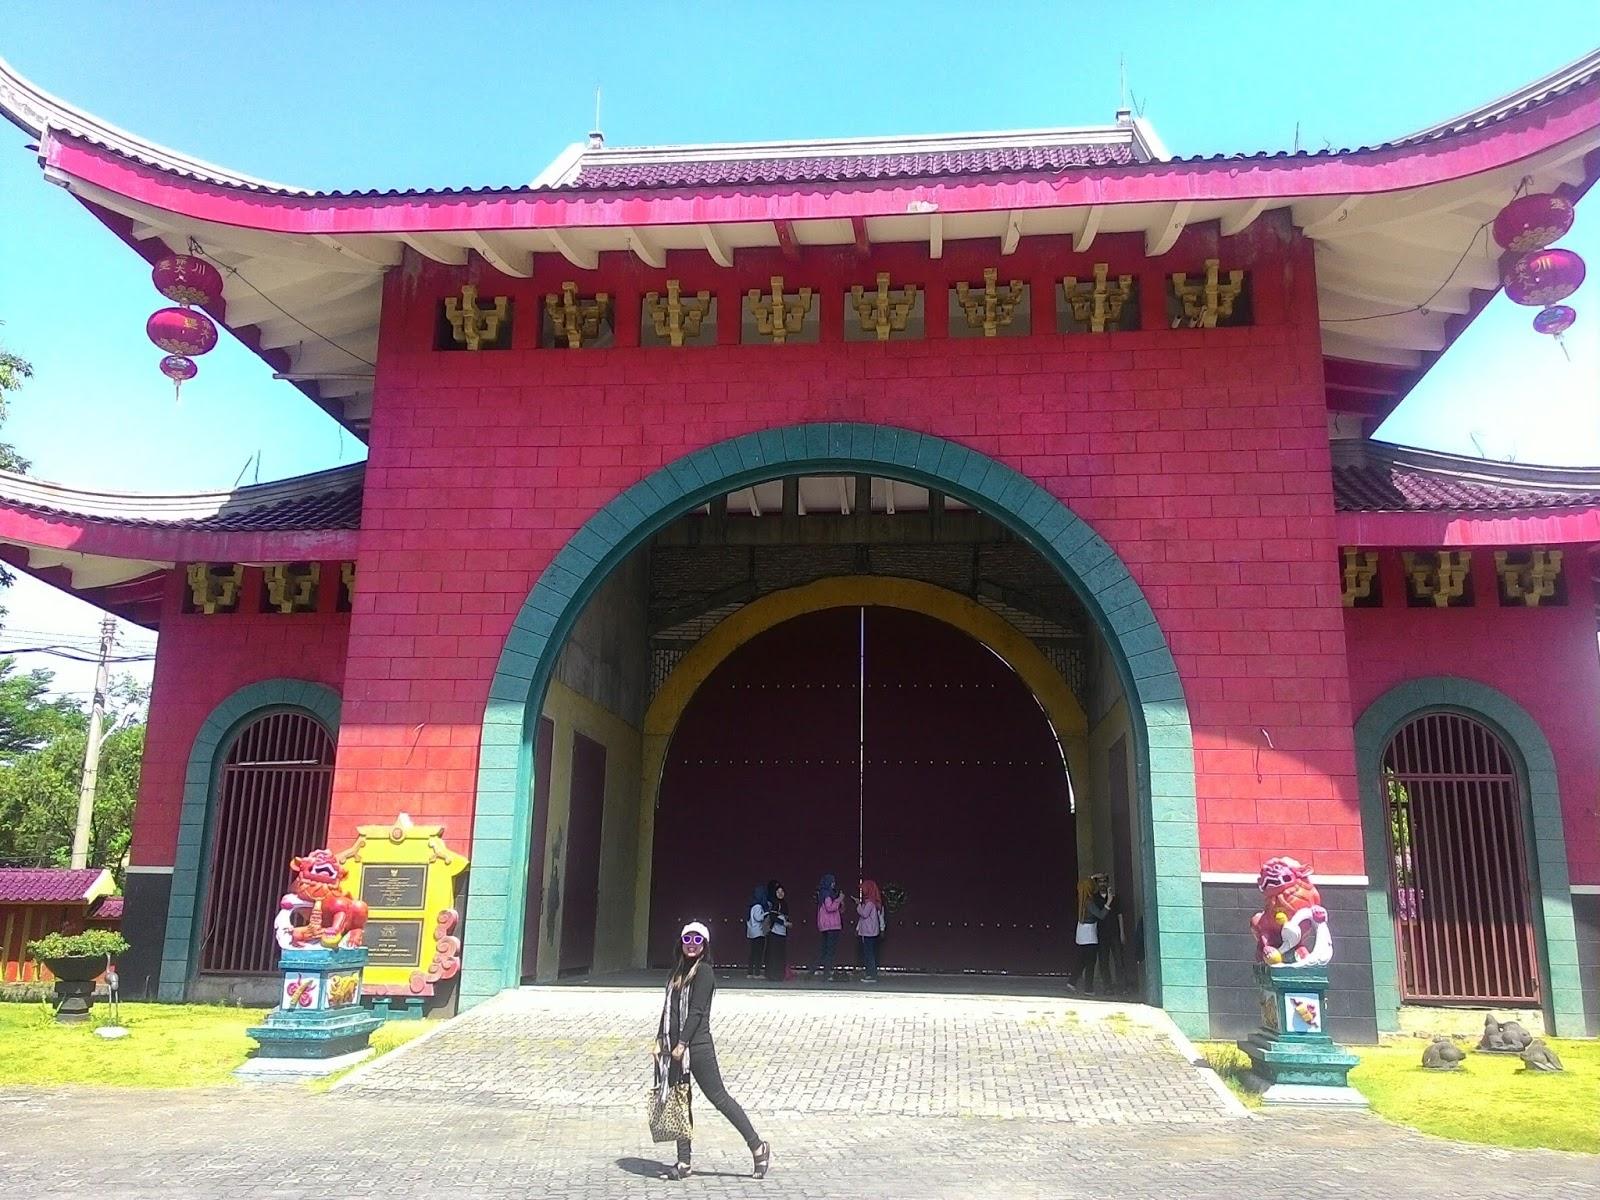 Indriani Blog Explore Kota Kecil Semarang Jawa Tengah Kelenteng Gedung